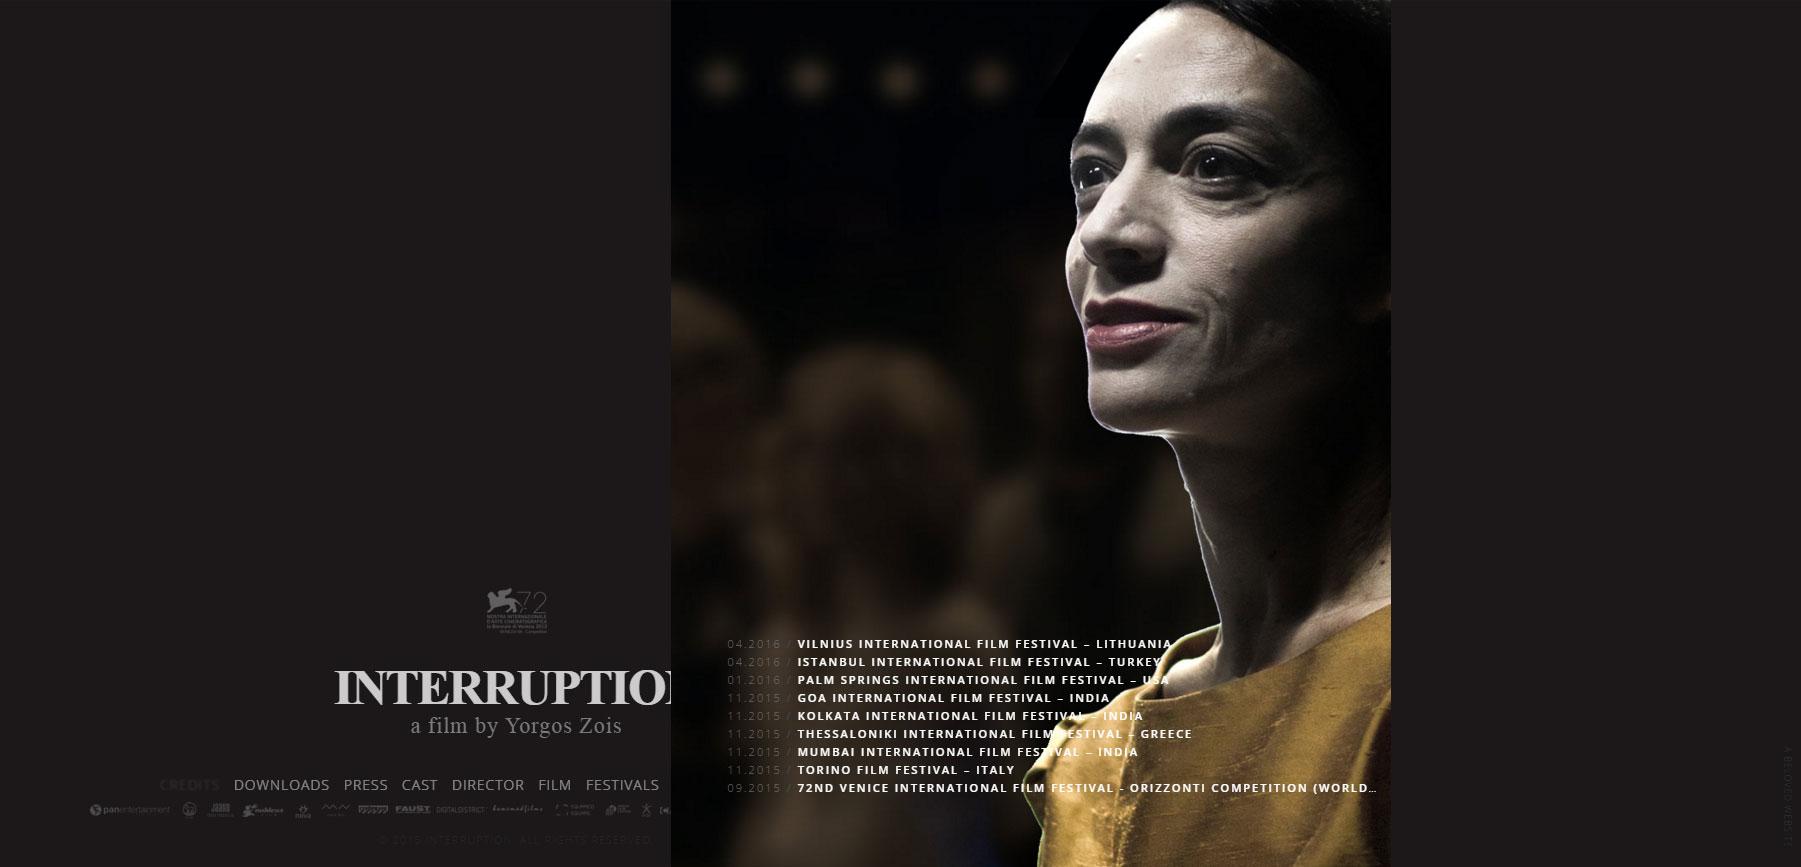 INTERRUPTION FILM - Website of the Day